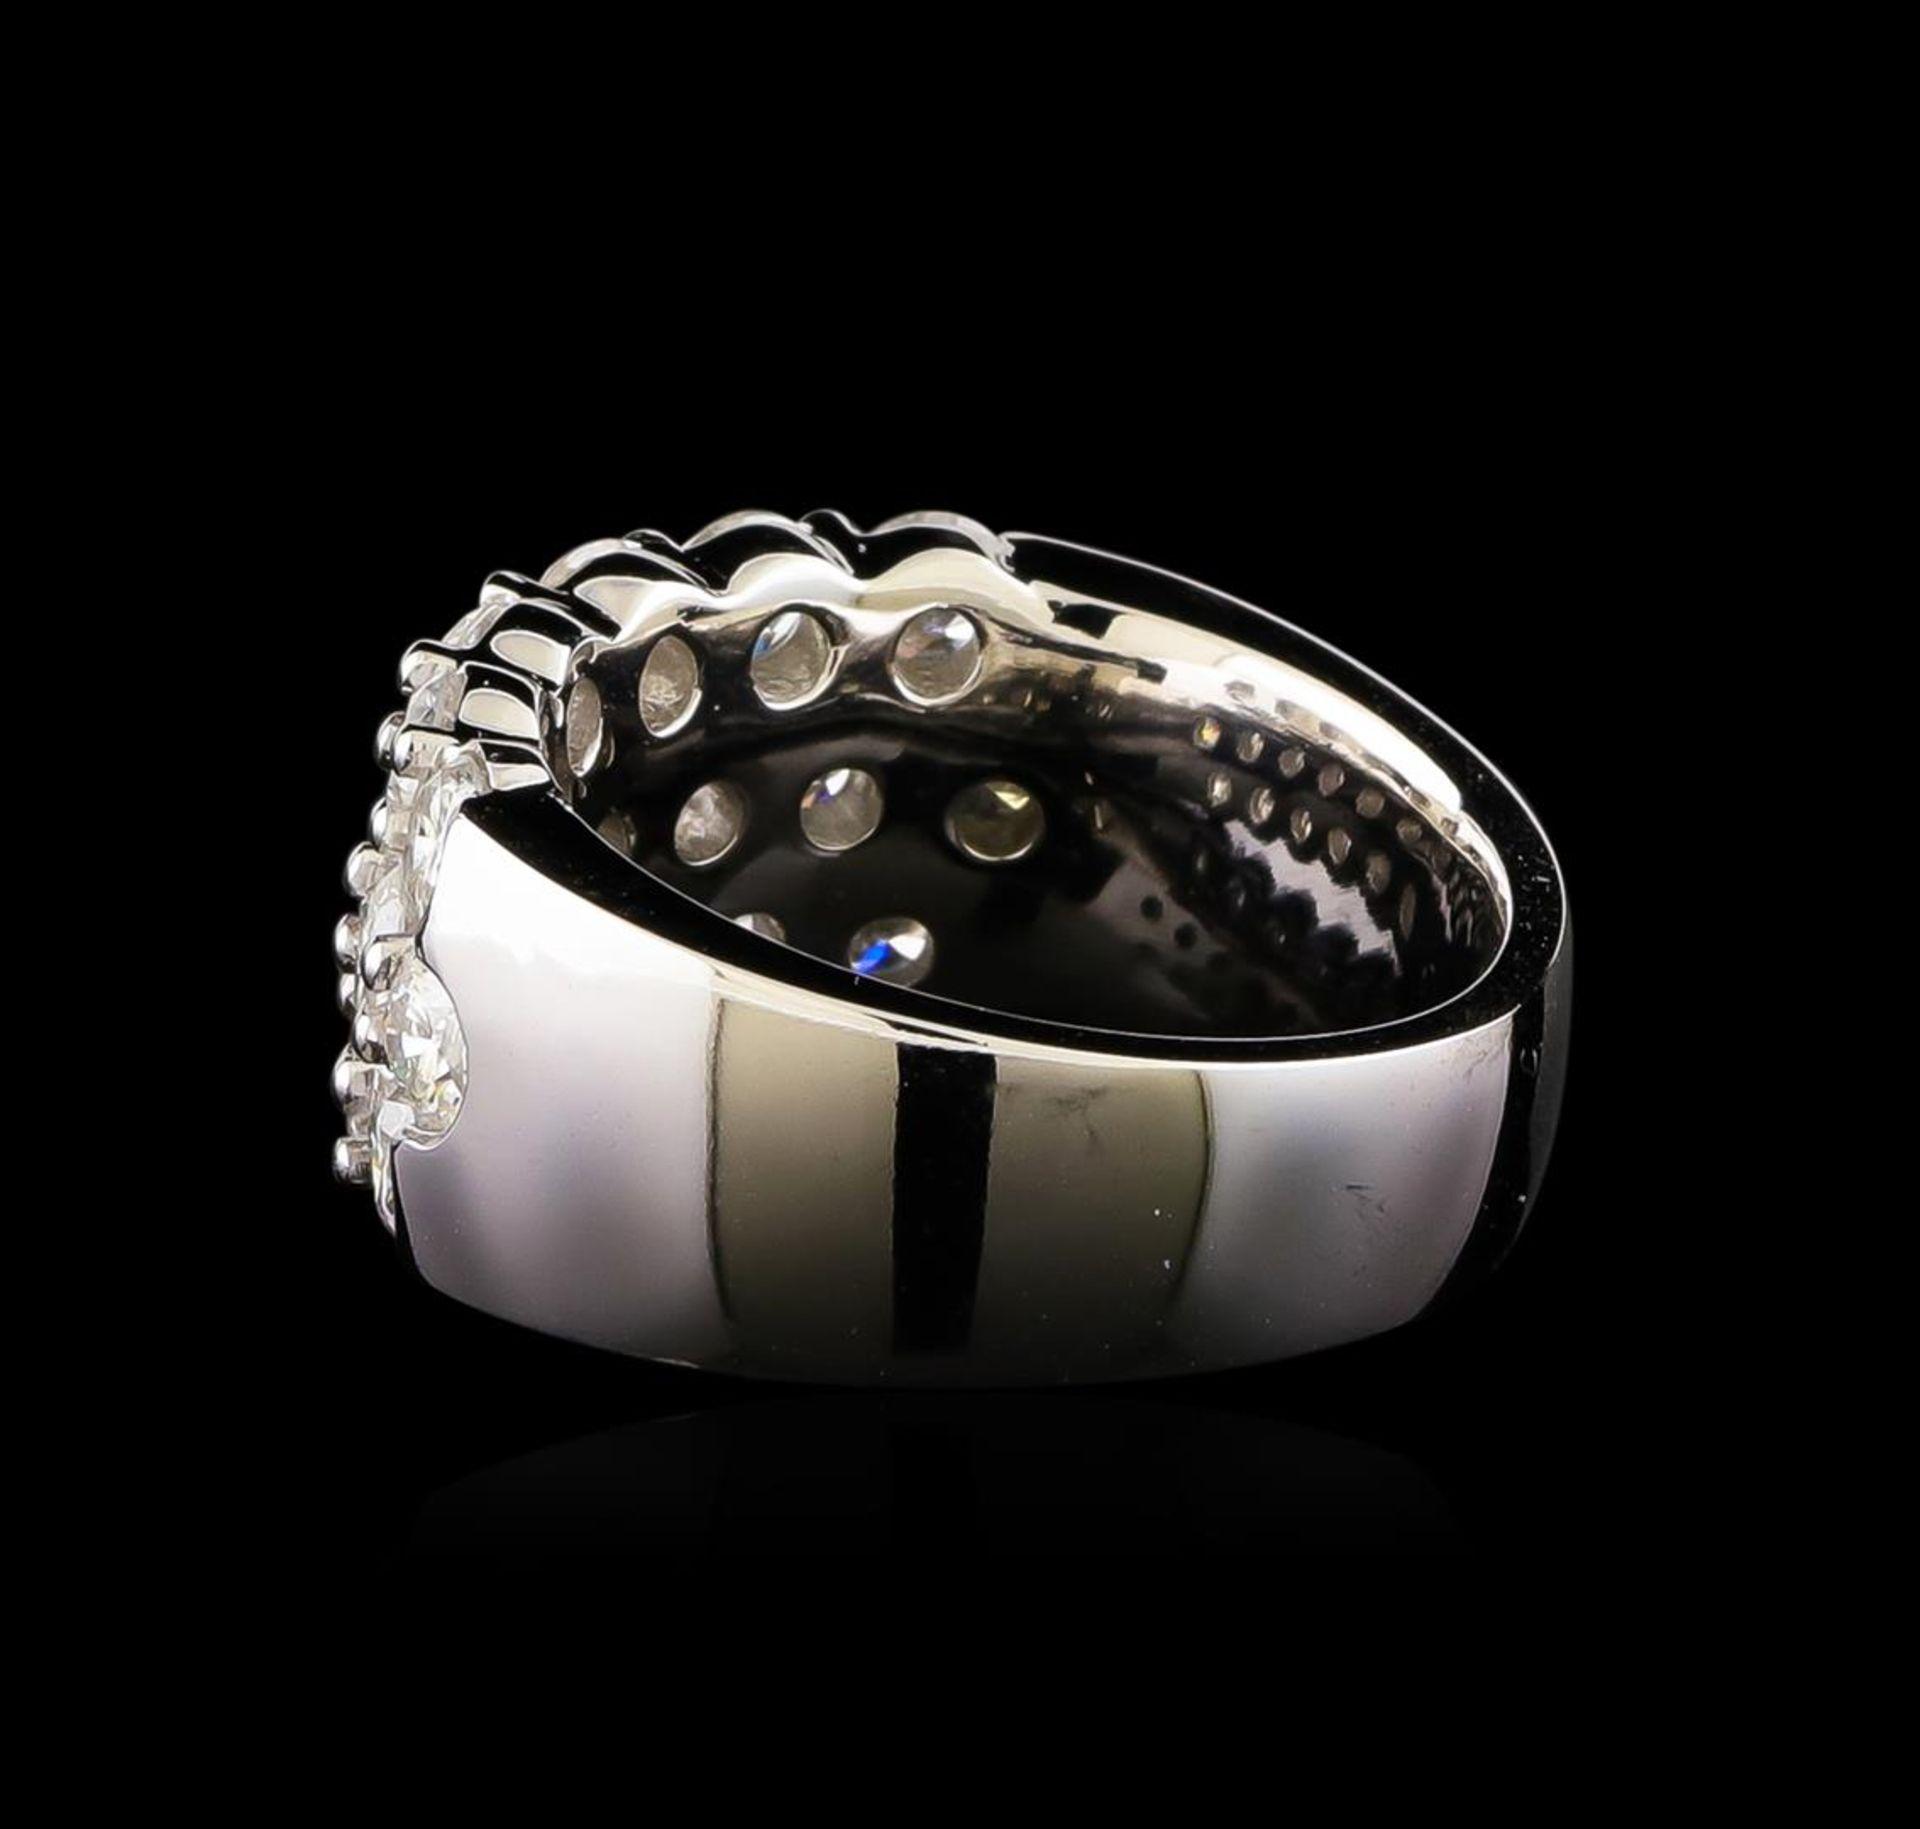 14KT White Gold 2.98 ctw Diamond Ring - Image 3 of 5